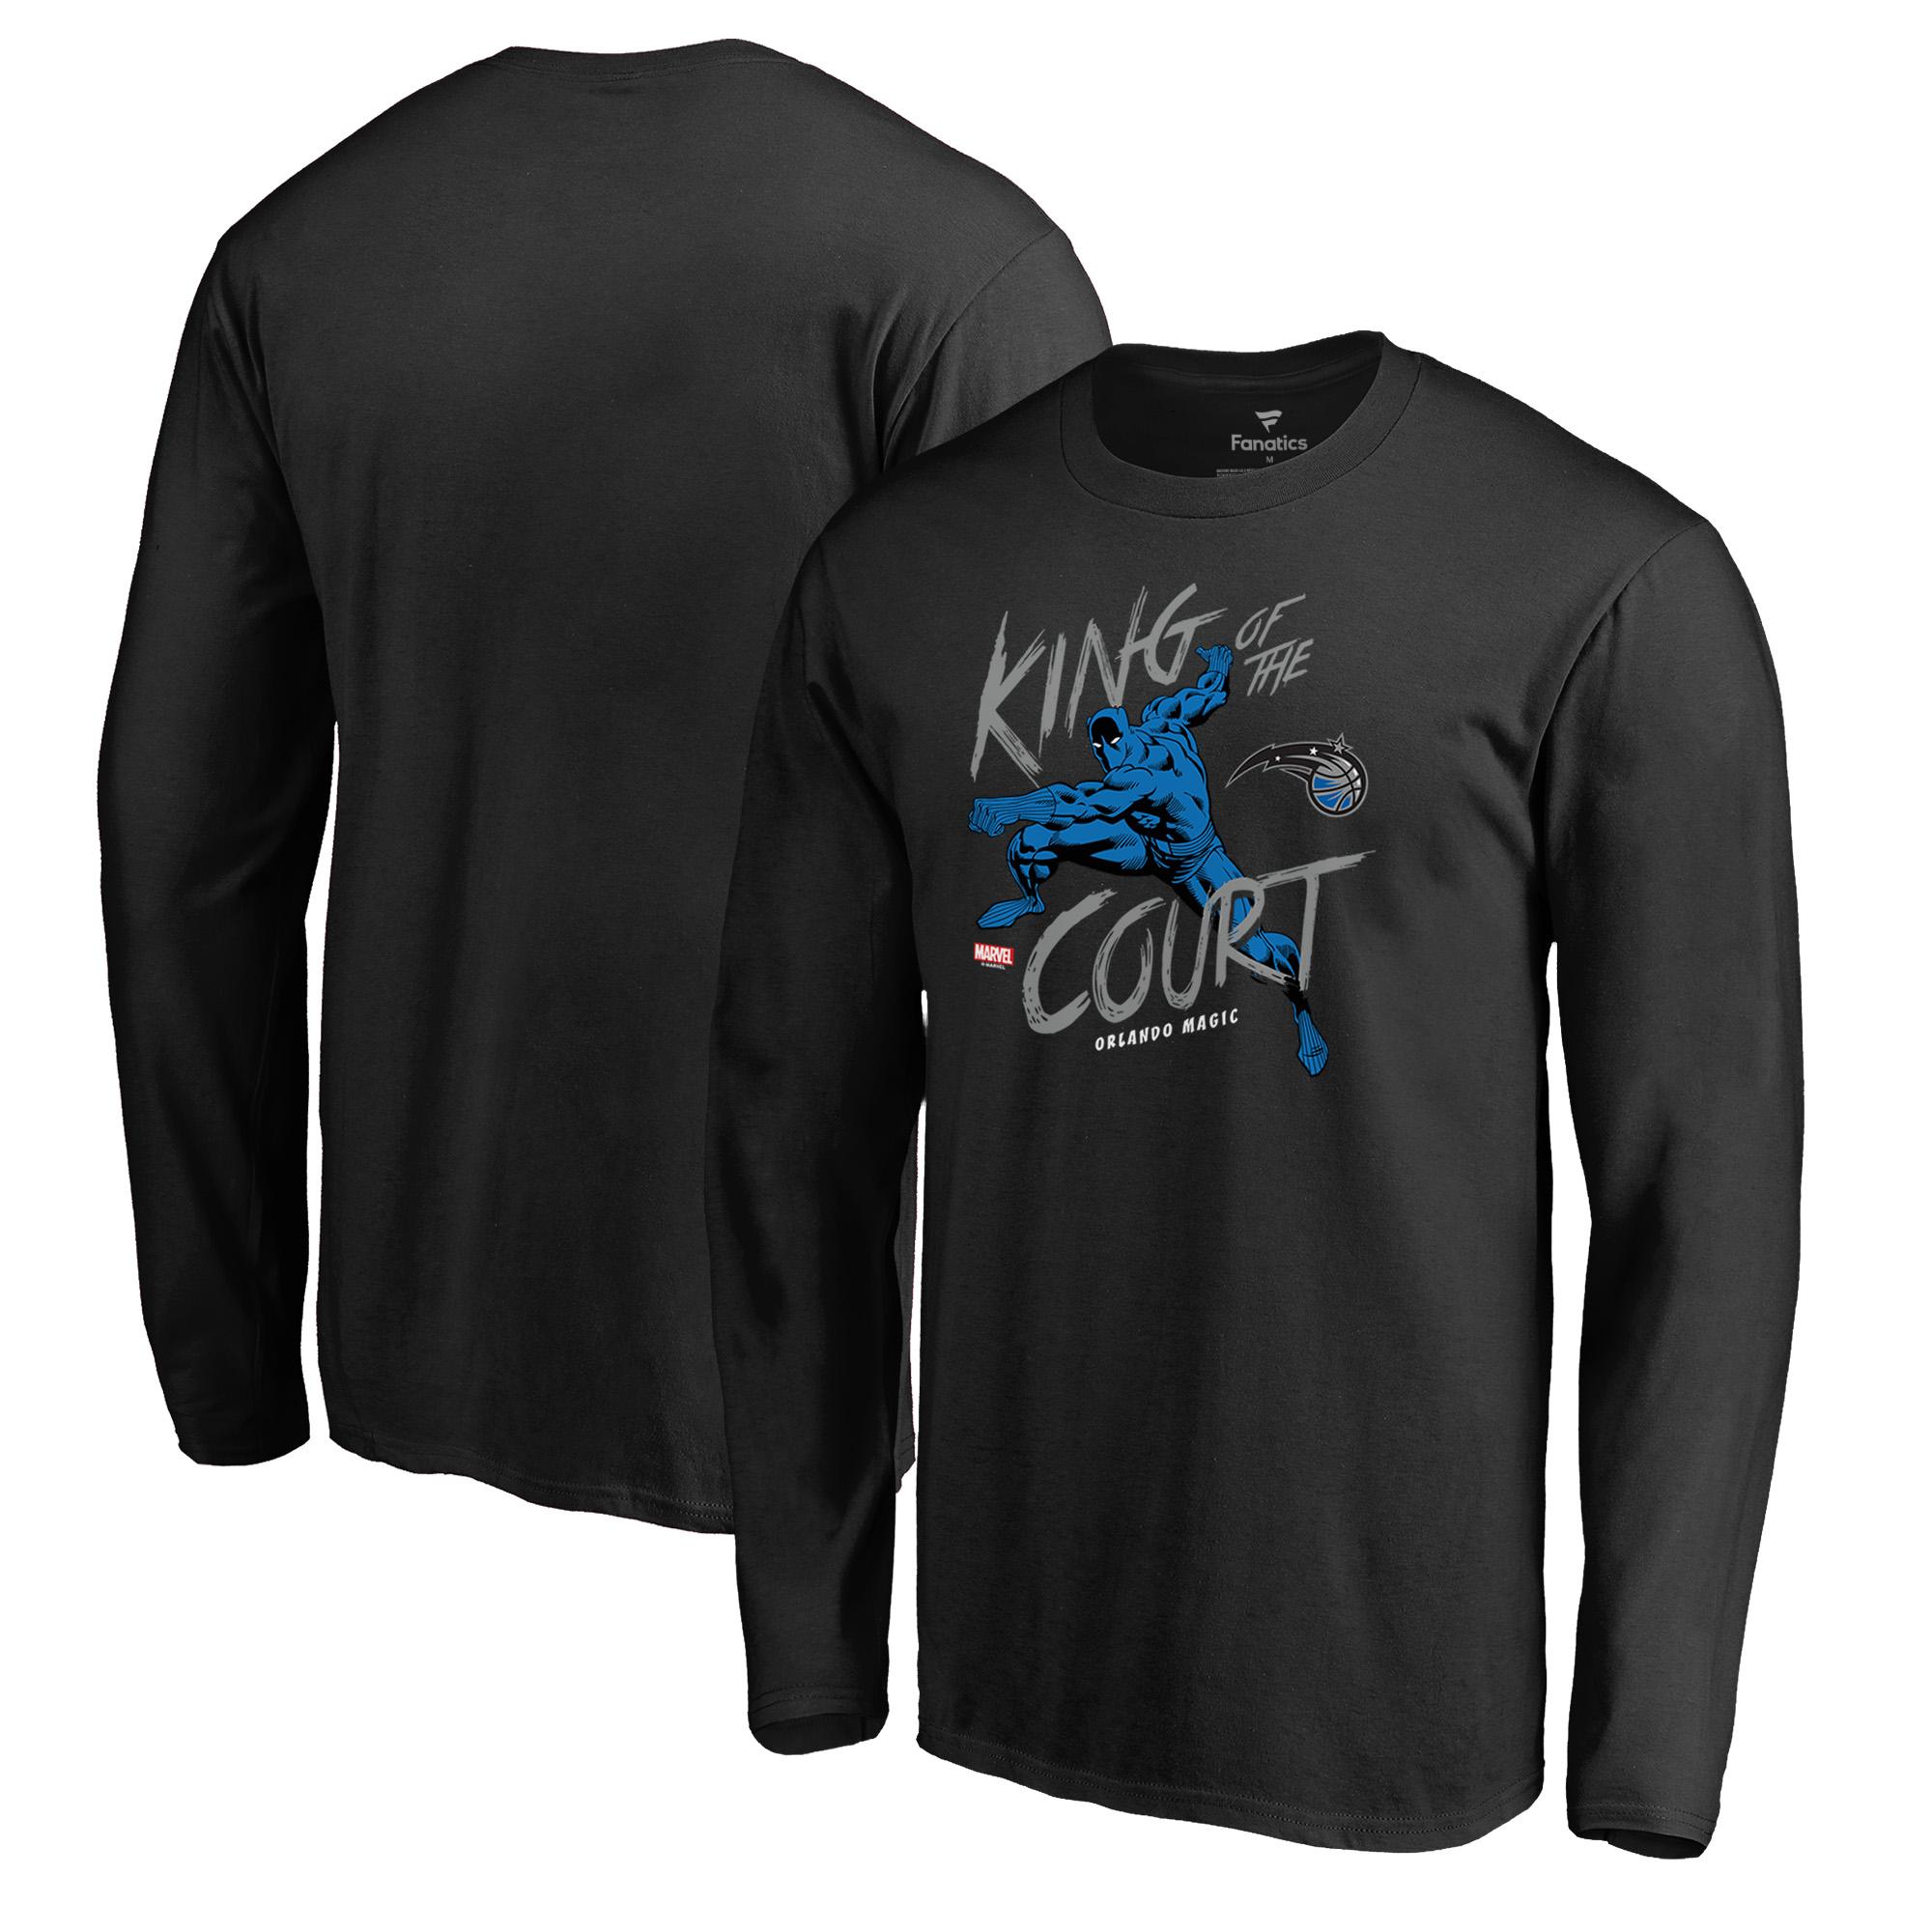 Orlando Magic Fanatics Branded Marvel Black Panther King of the Court Long Sleeve T-Shirt - Black